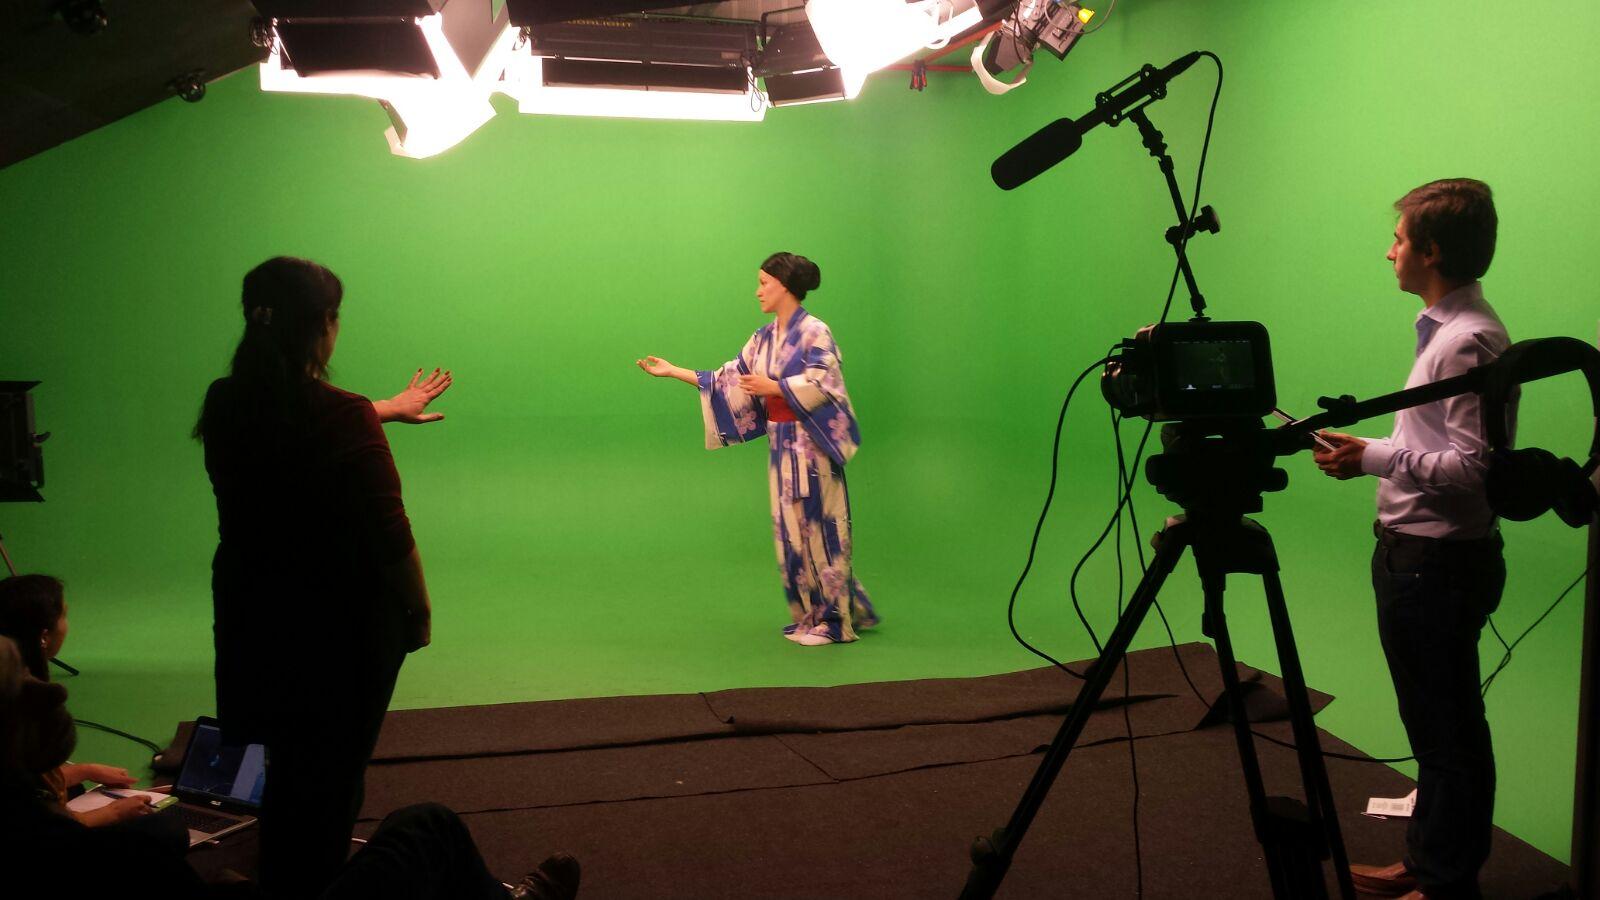 Productora audiovisual en Barcelona